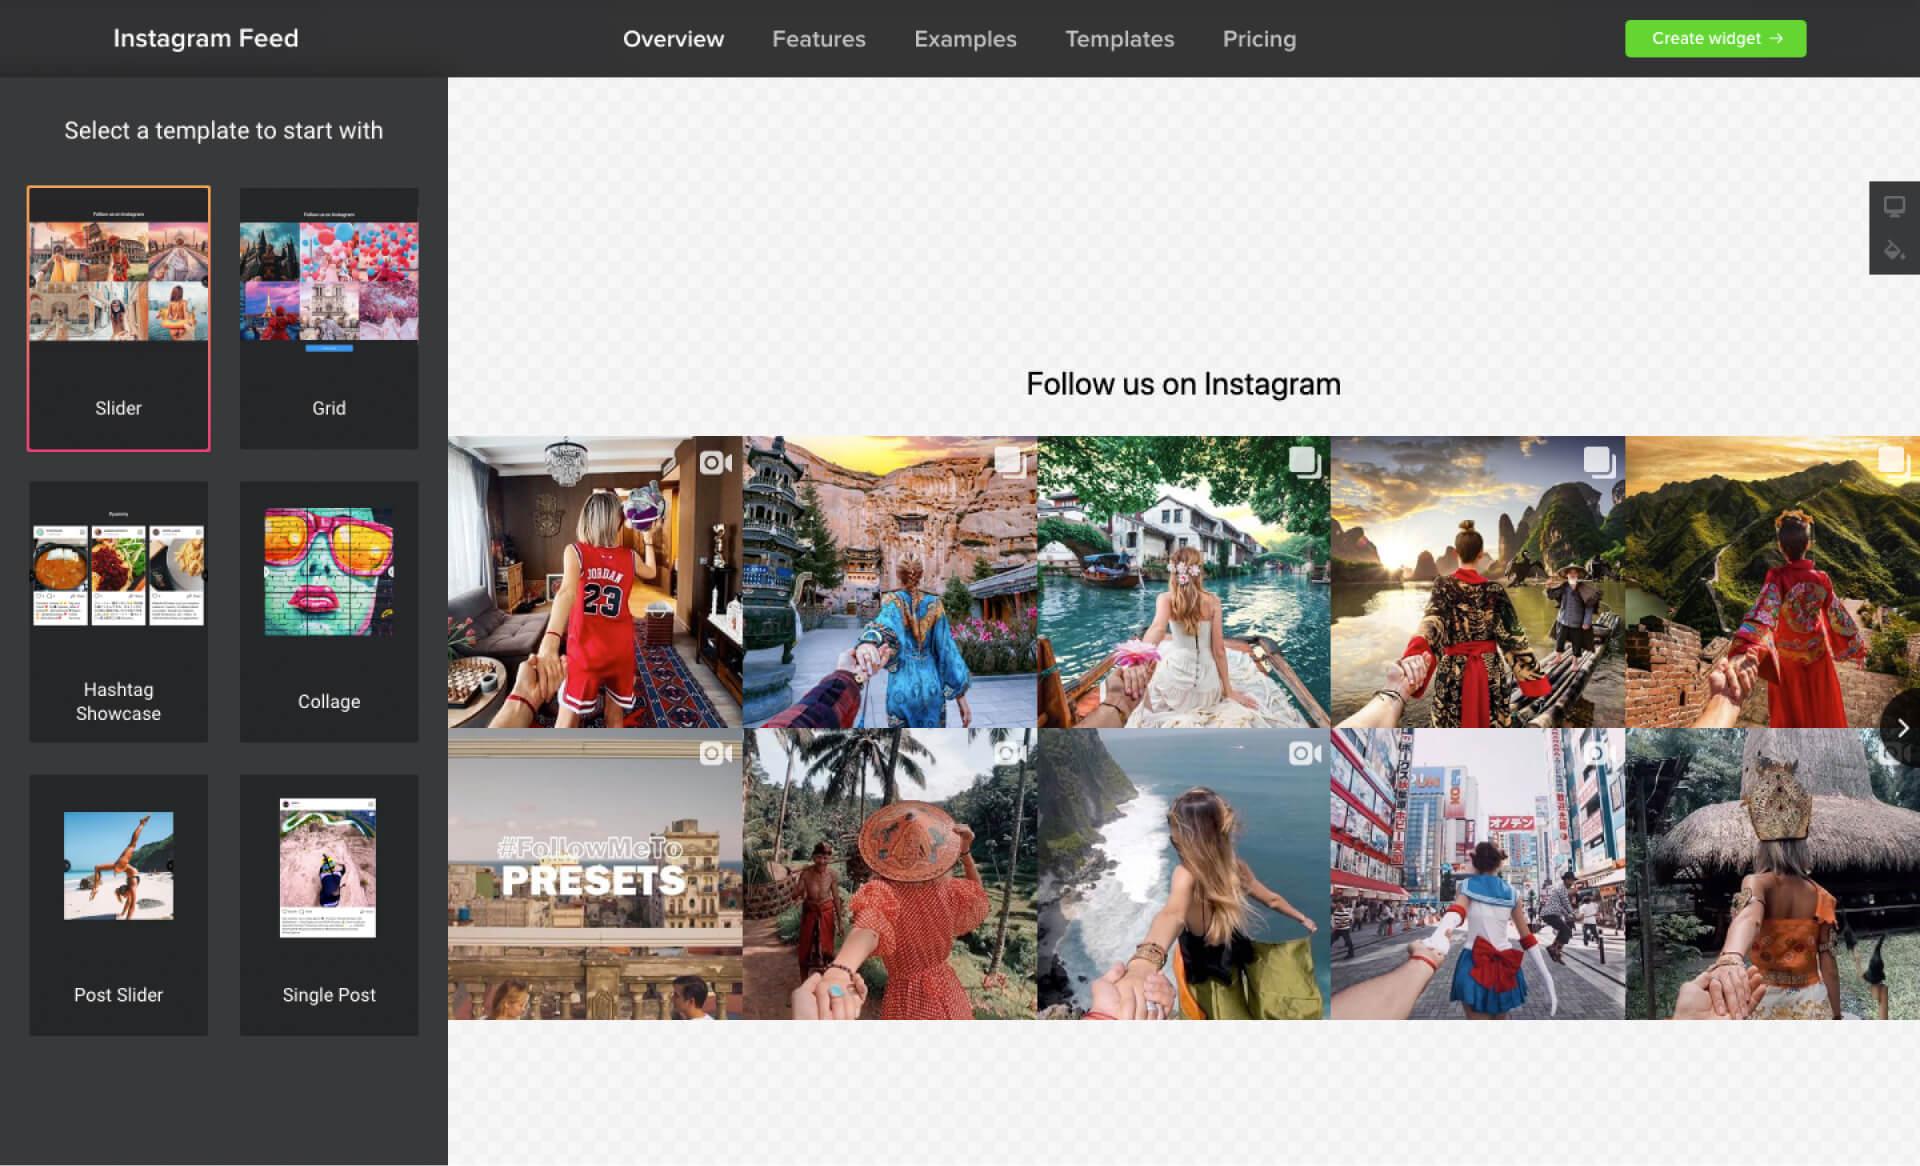 Instagram Feed — elfsight 外掛設定介面(有質感又直覺的使用經驗)-IrvingLab 爾文實驗室